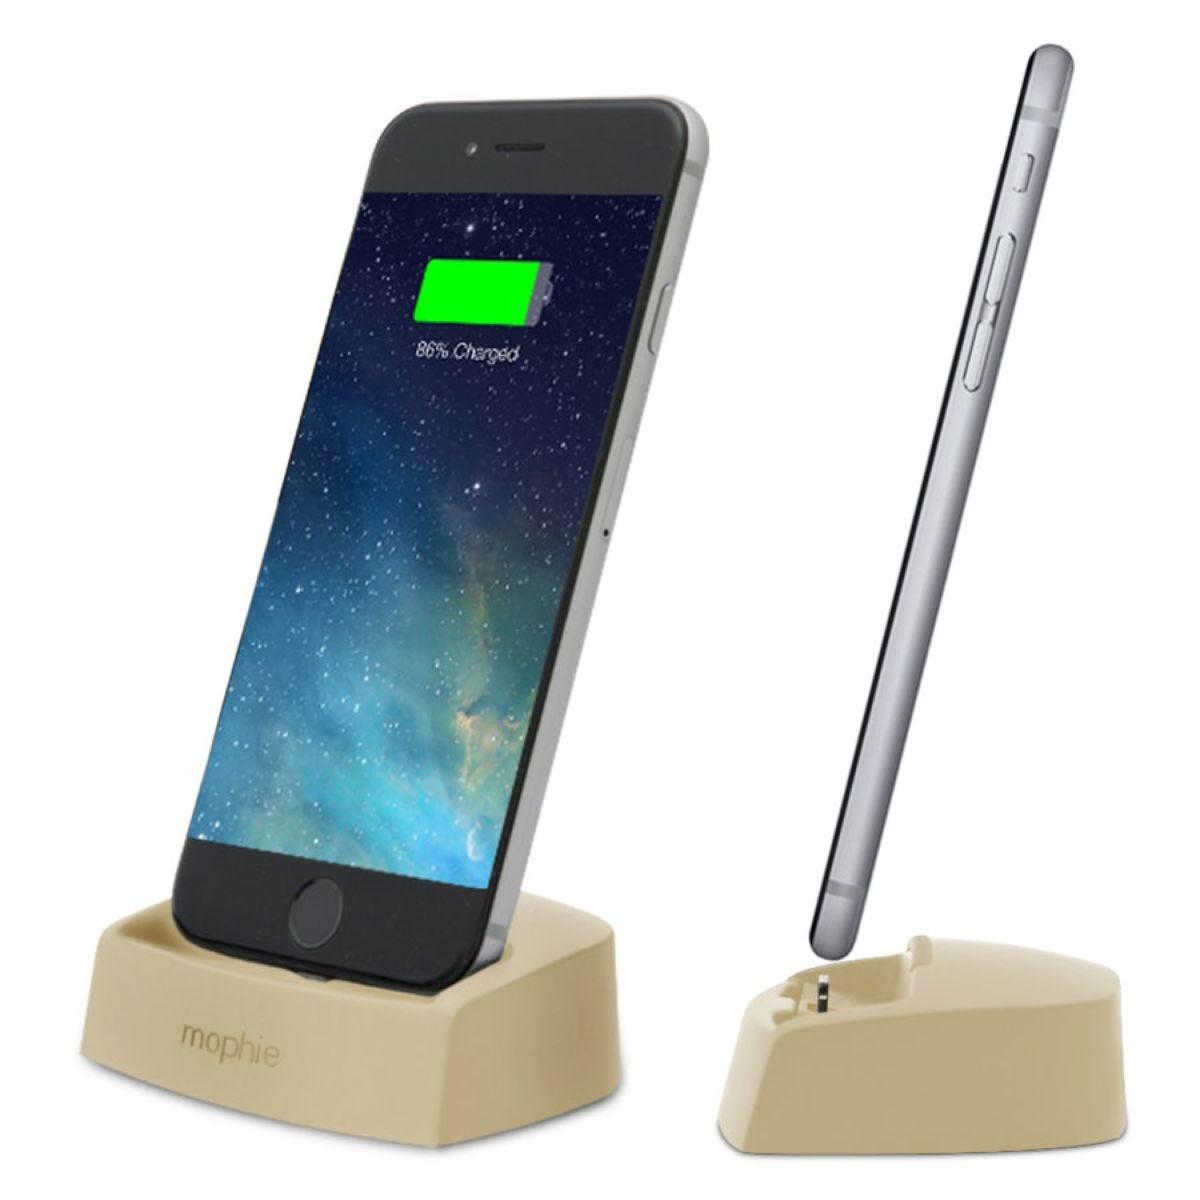 Mophie Desktop Dock Lighting Charger for iPhones - Gold